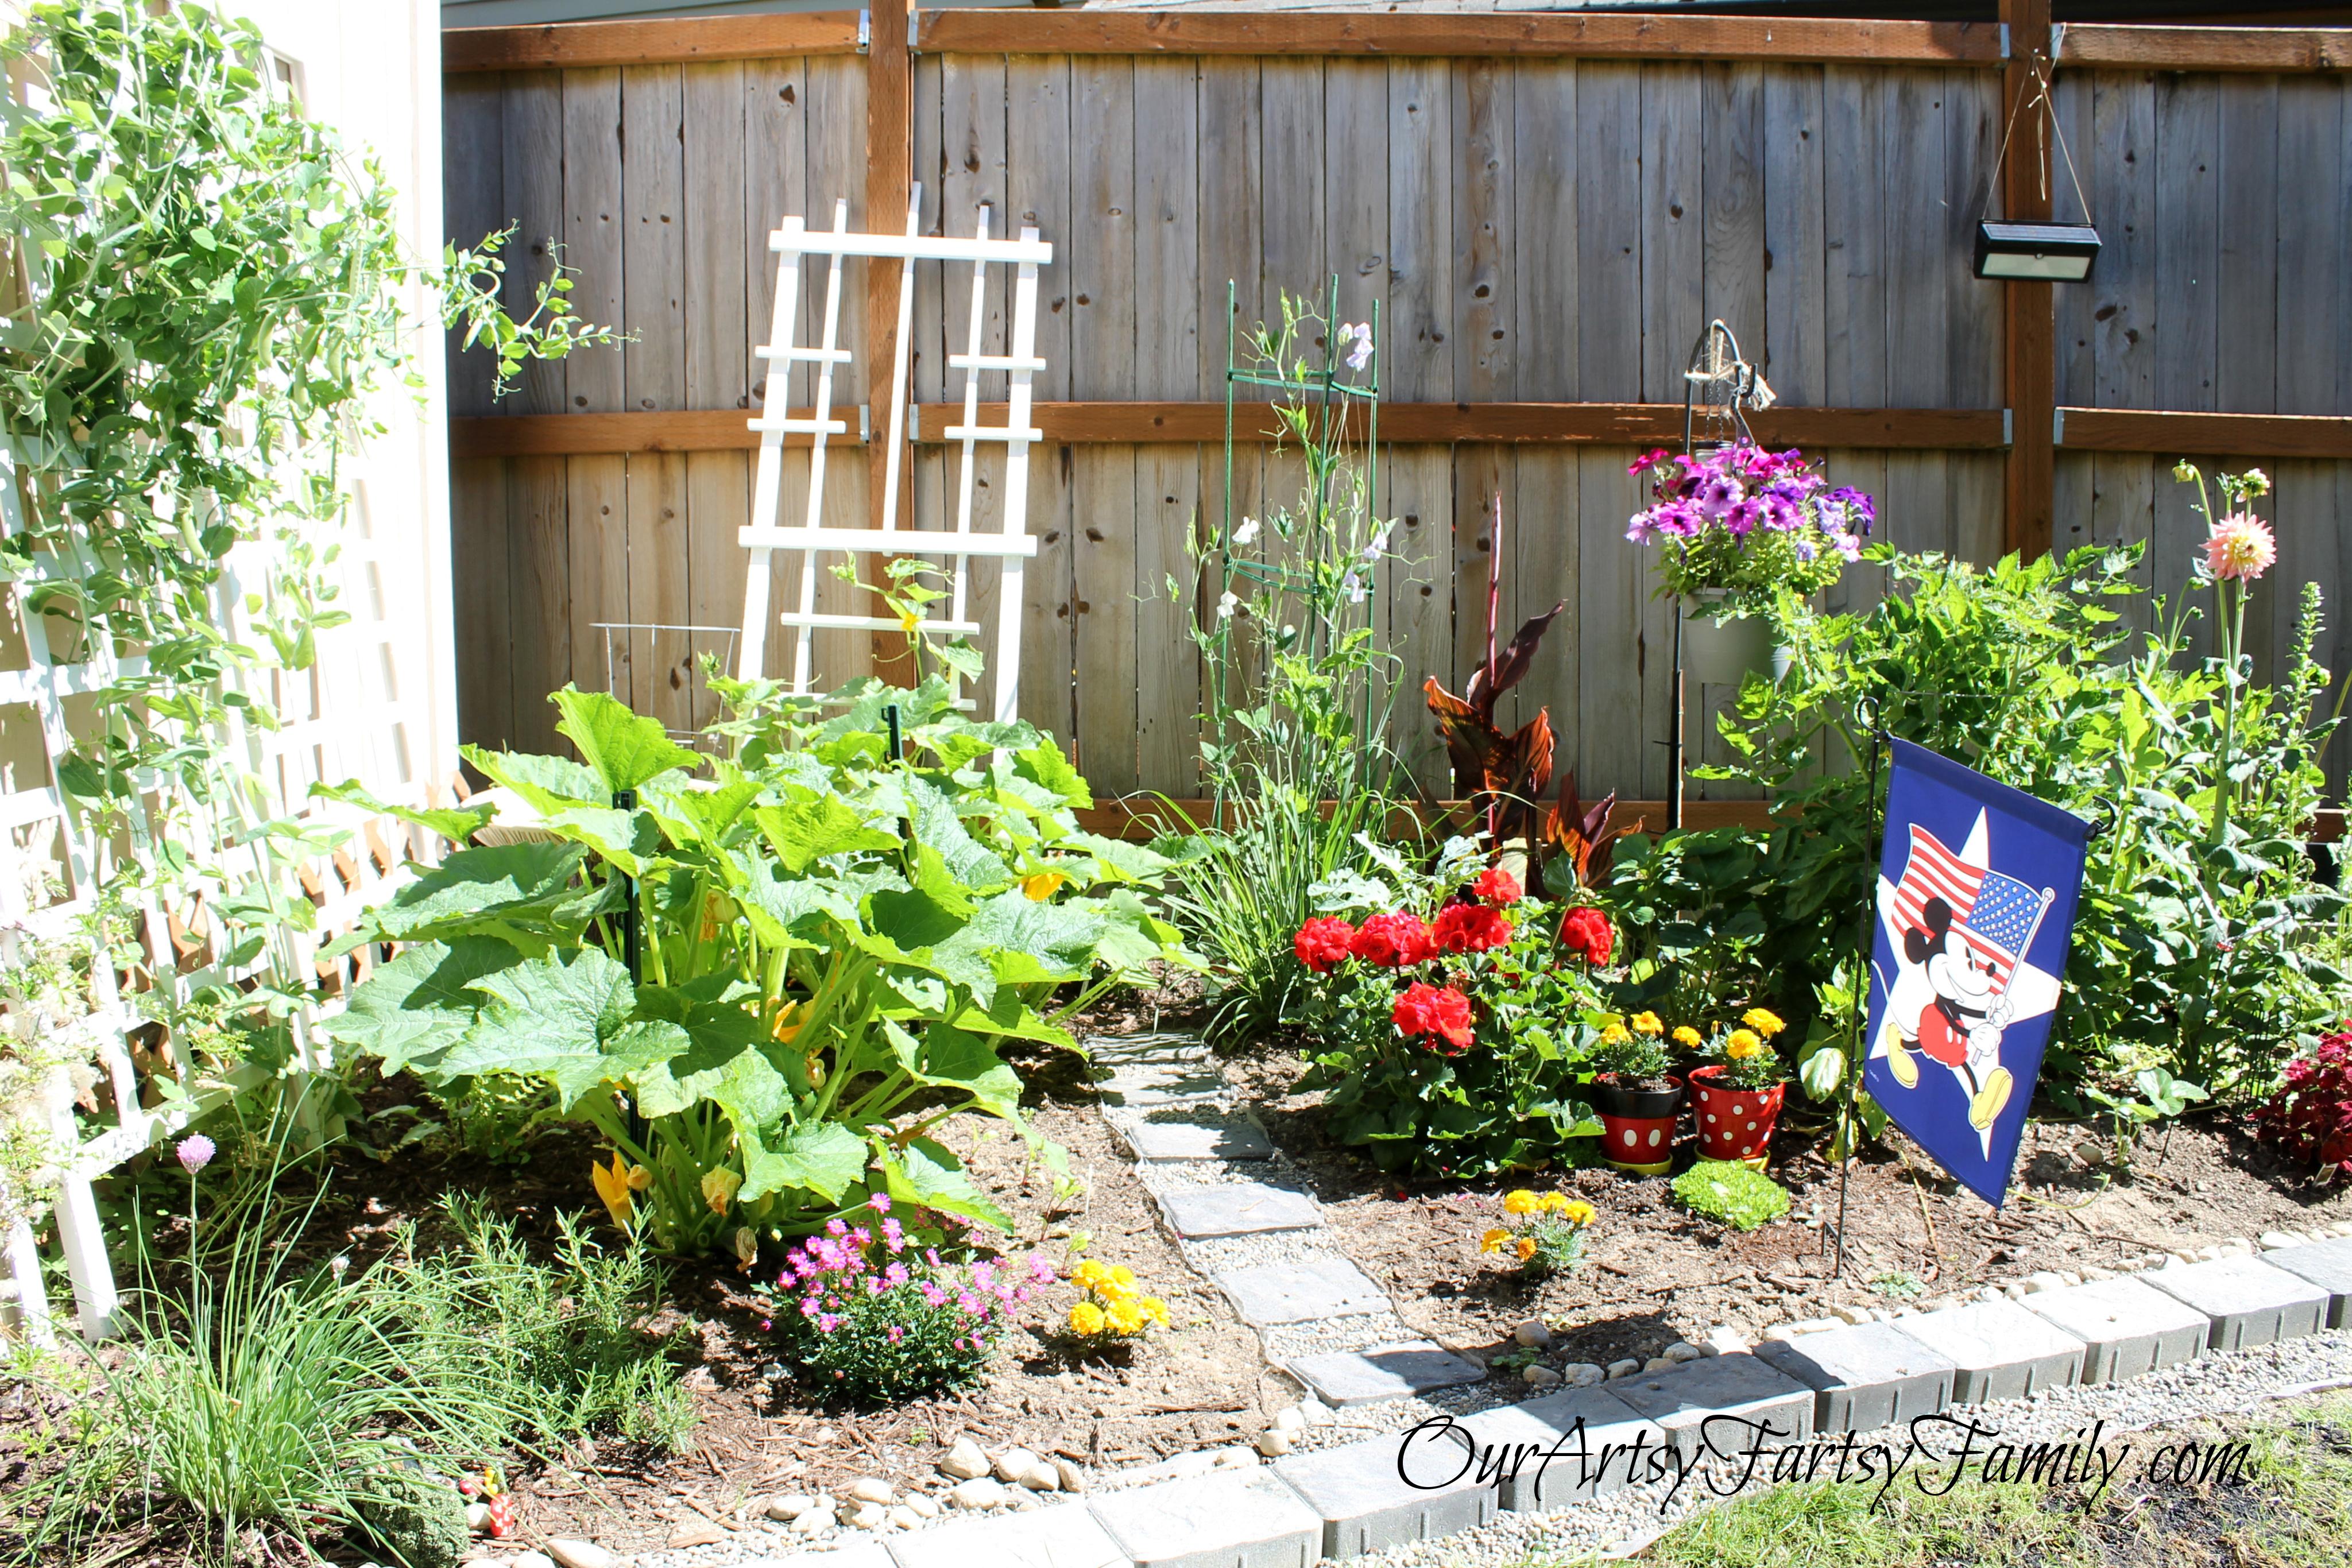 7-19-2020 Garden Artsy IMG_1179